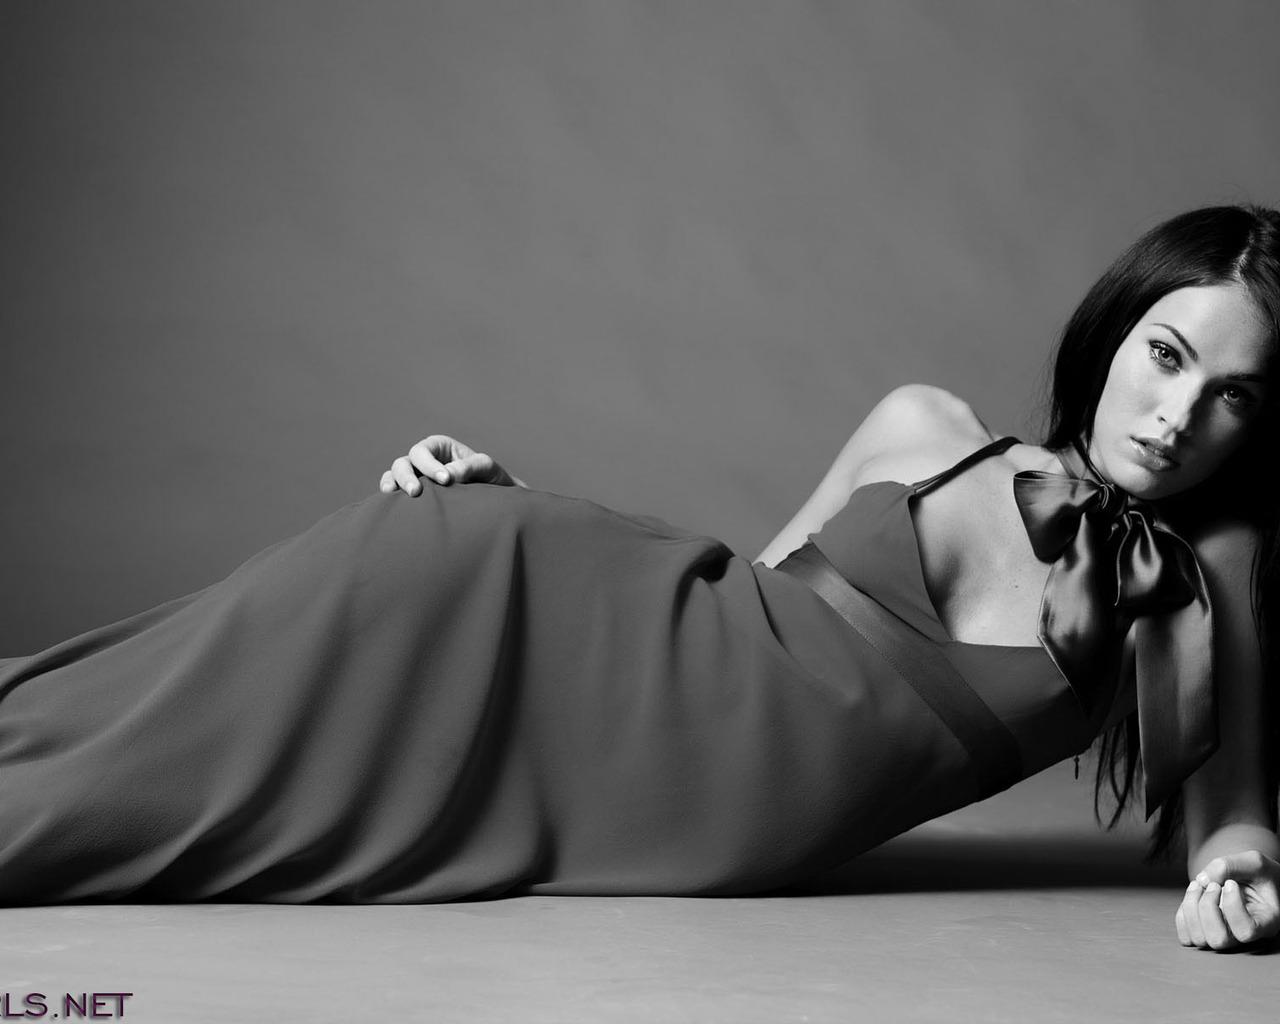 Megan Fox 1280x1024 wallpaper 1280x1024